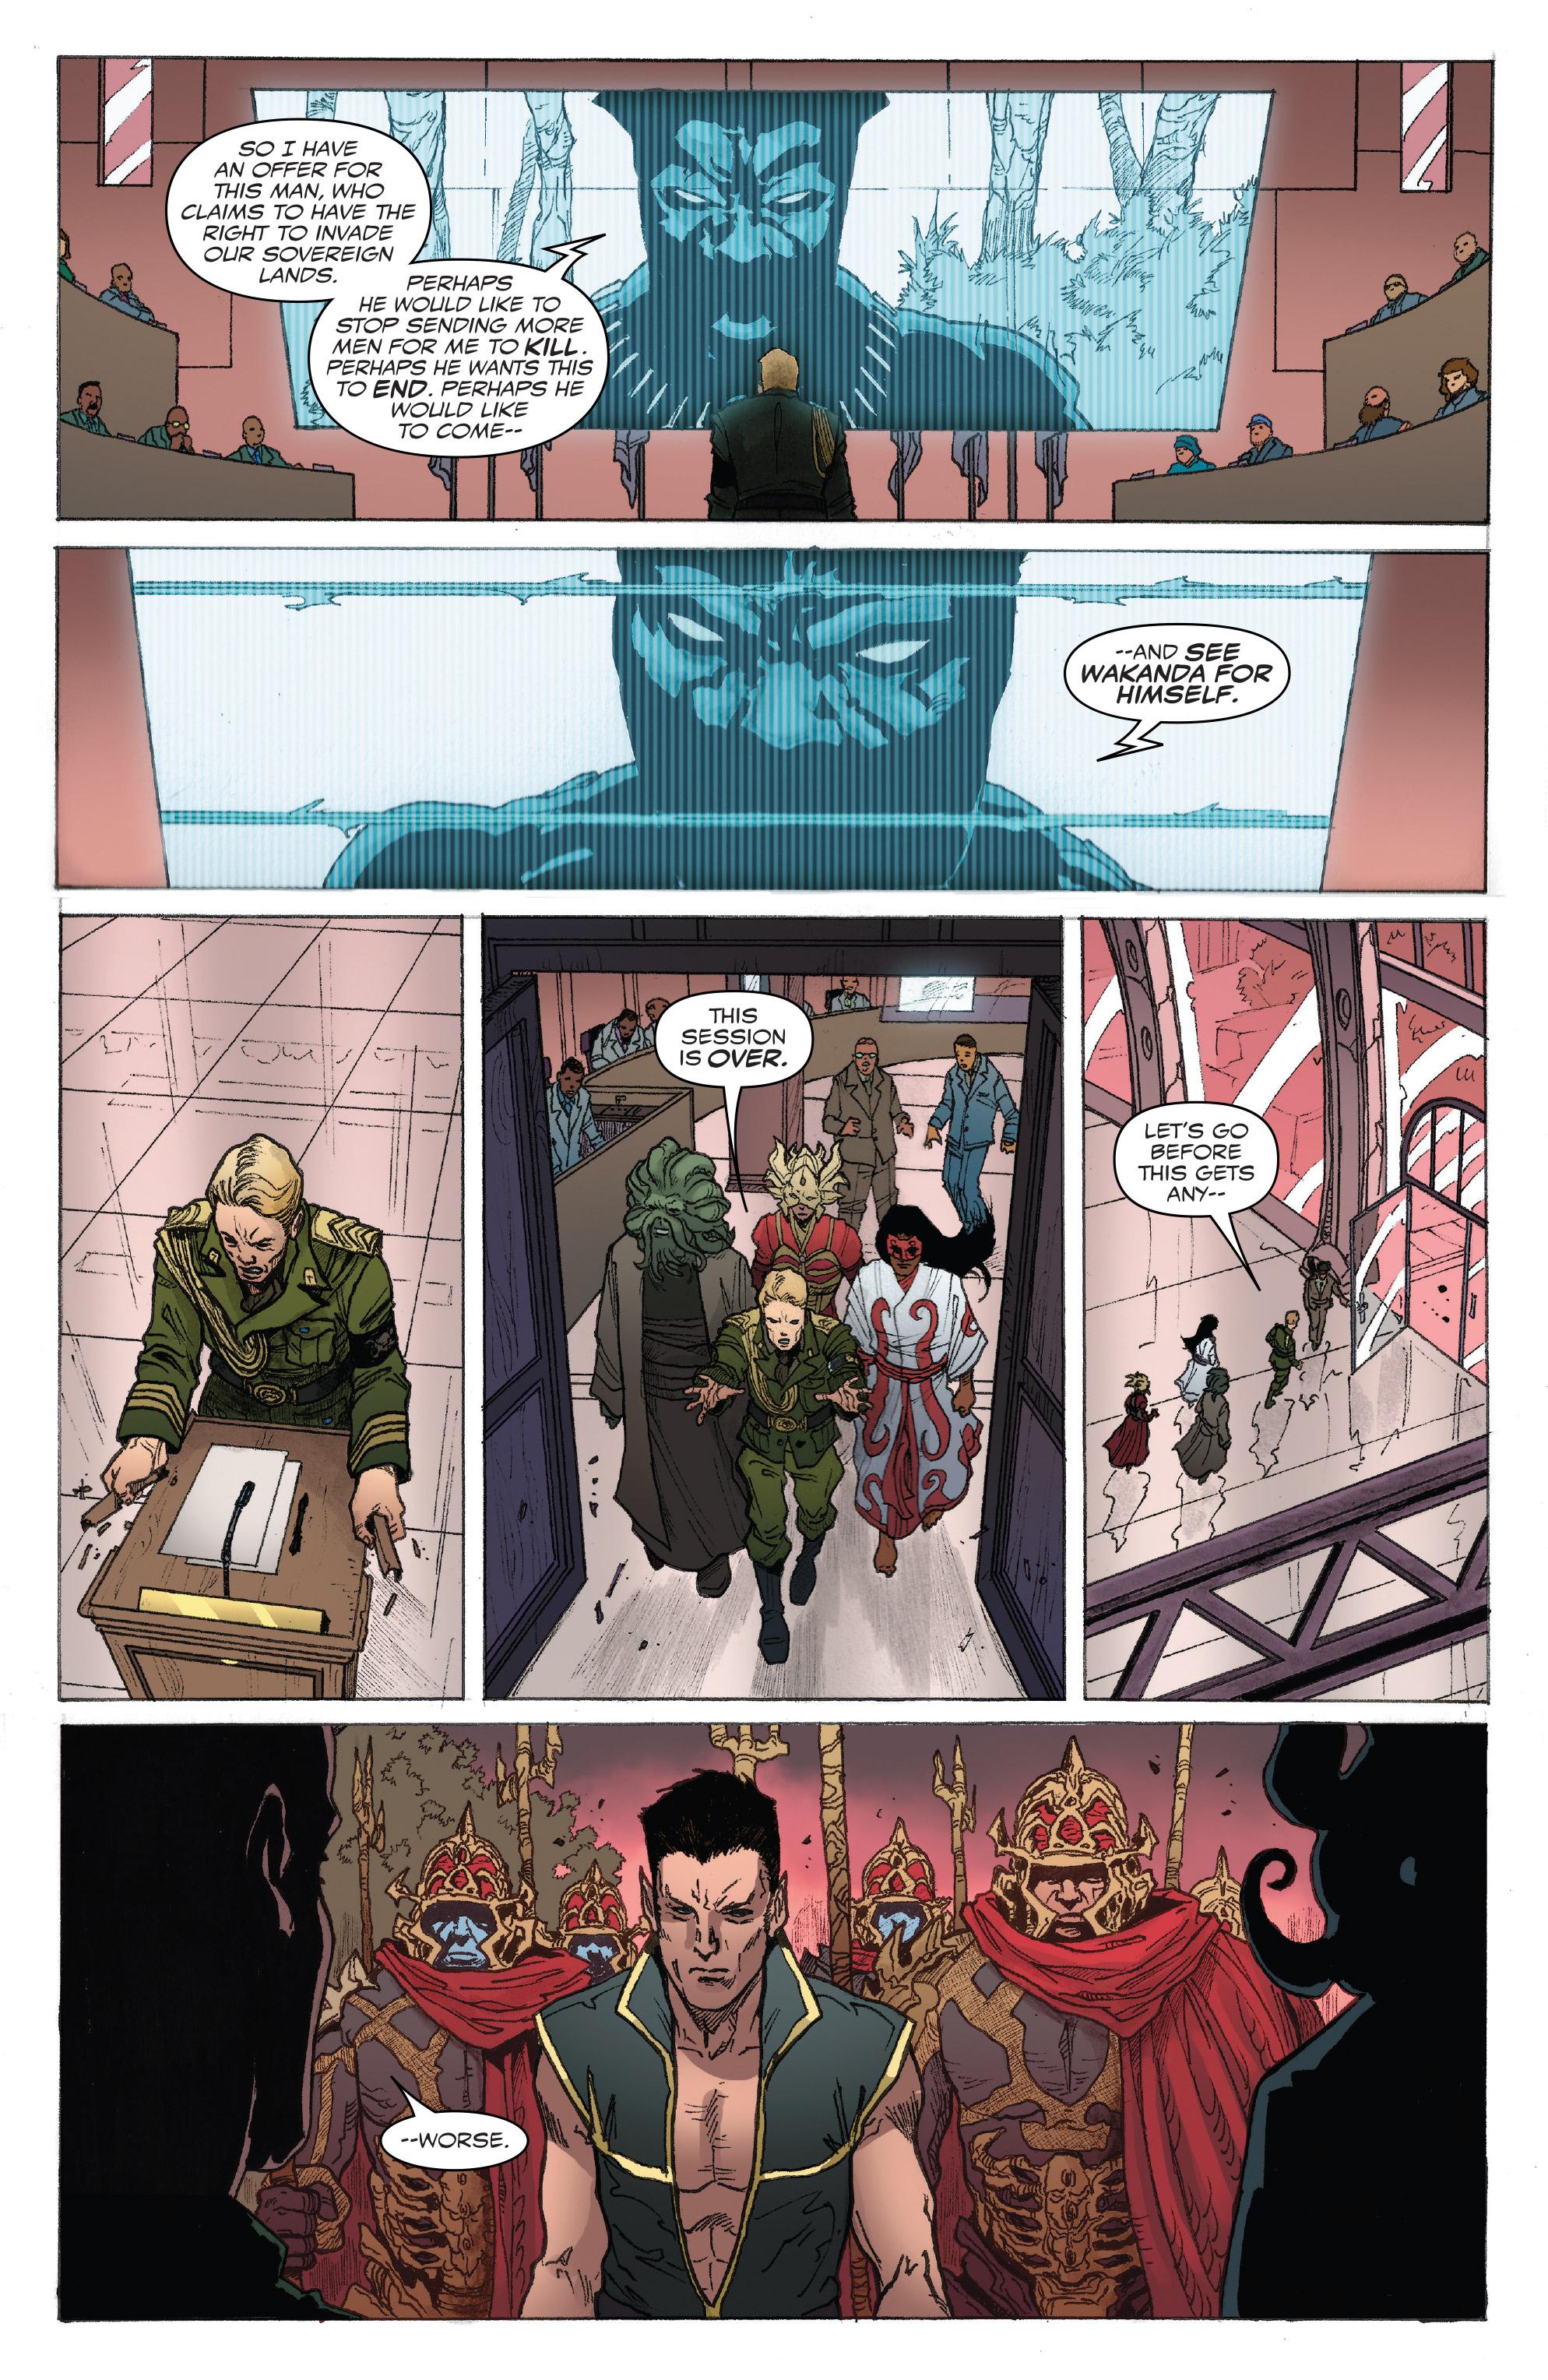 Read online Captain America: Steve Rogers comic -  Issue #18 - 19